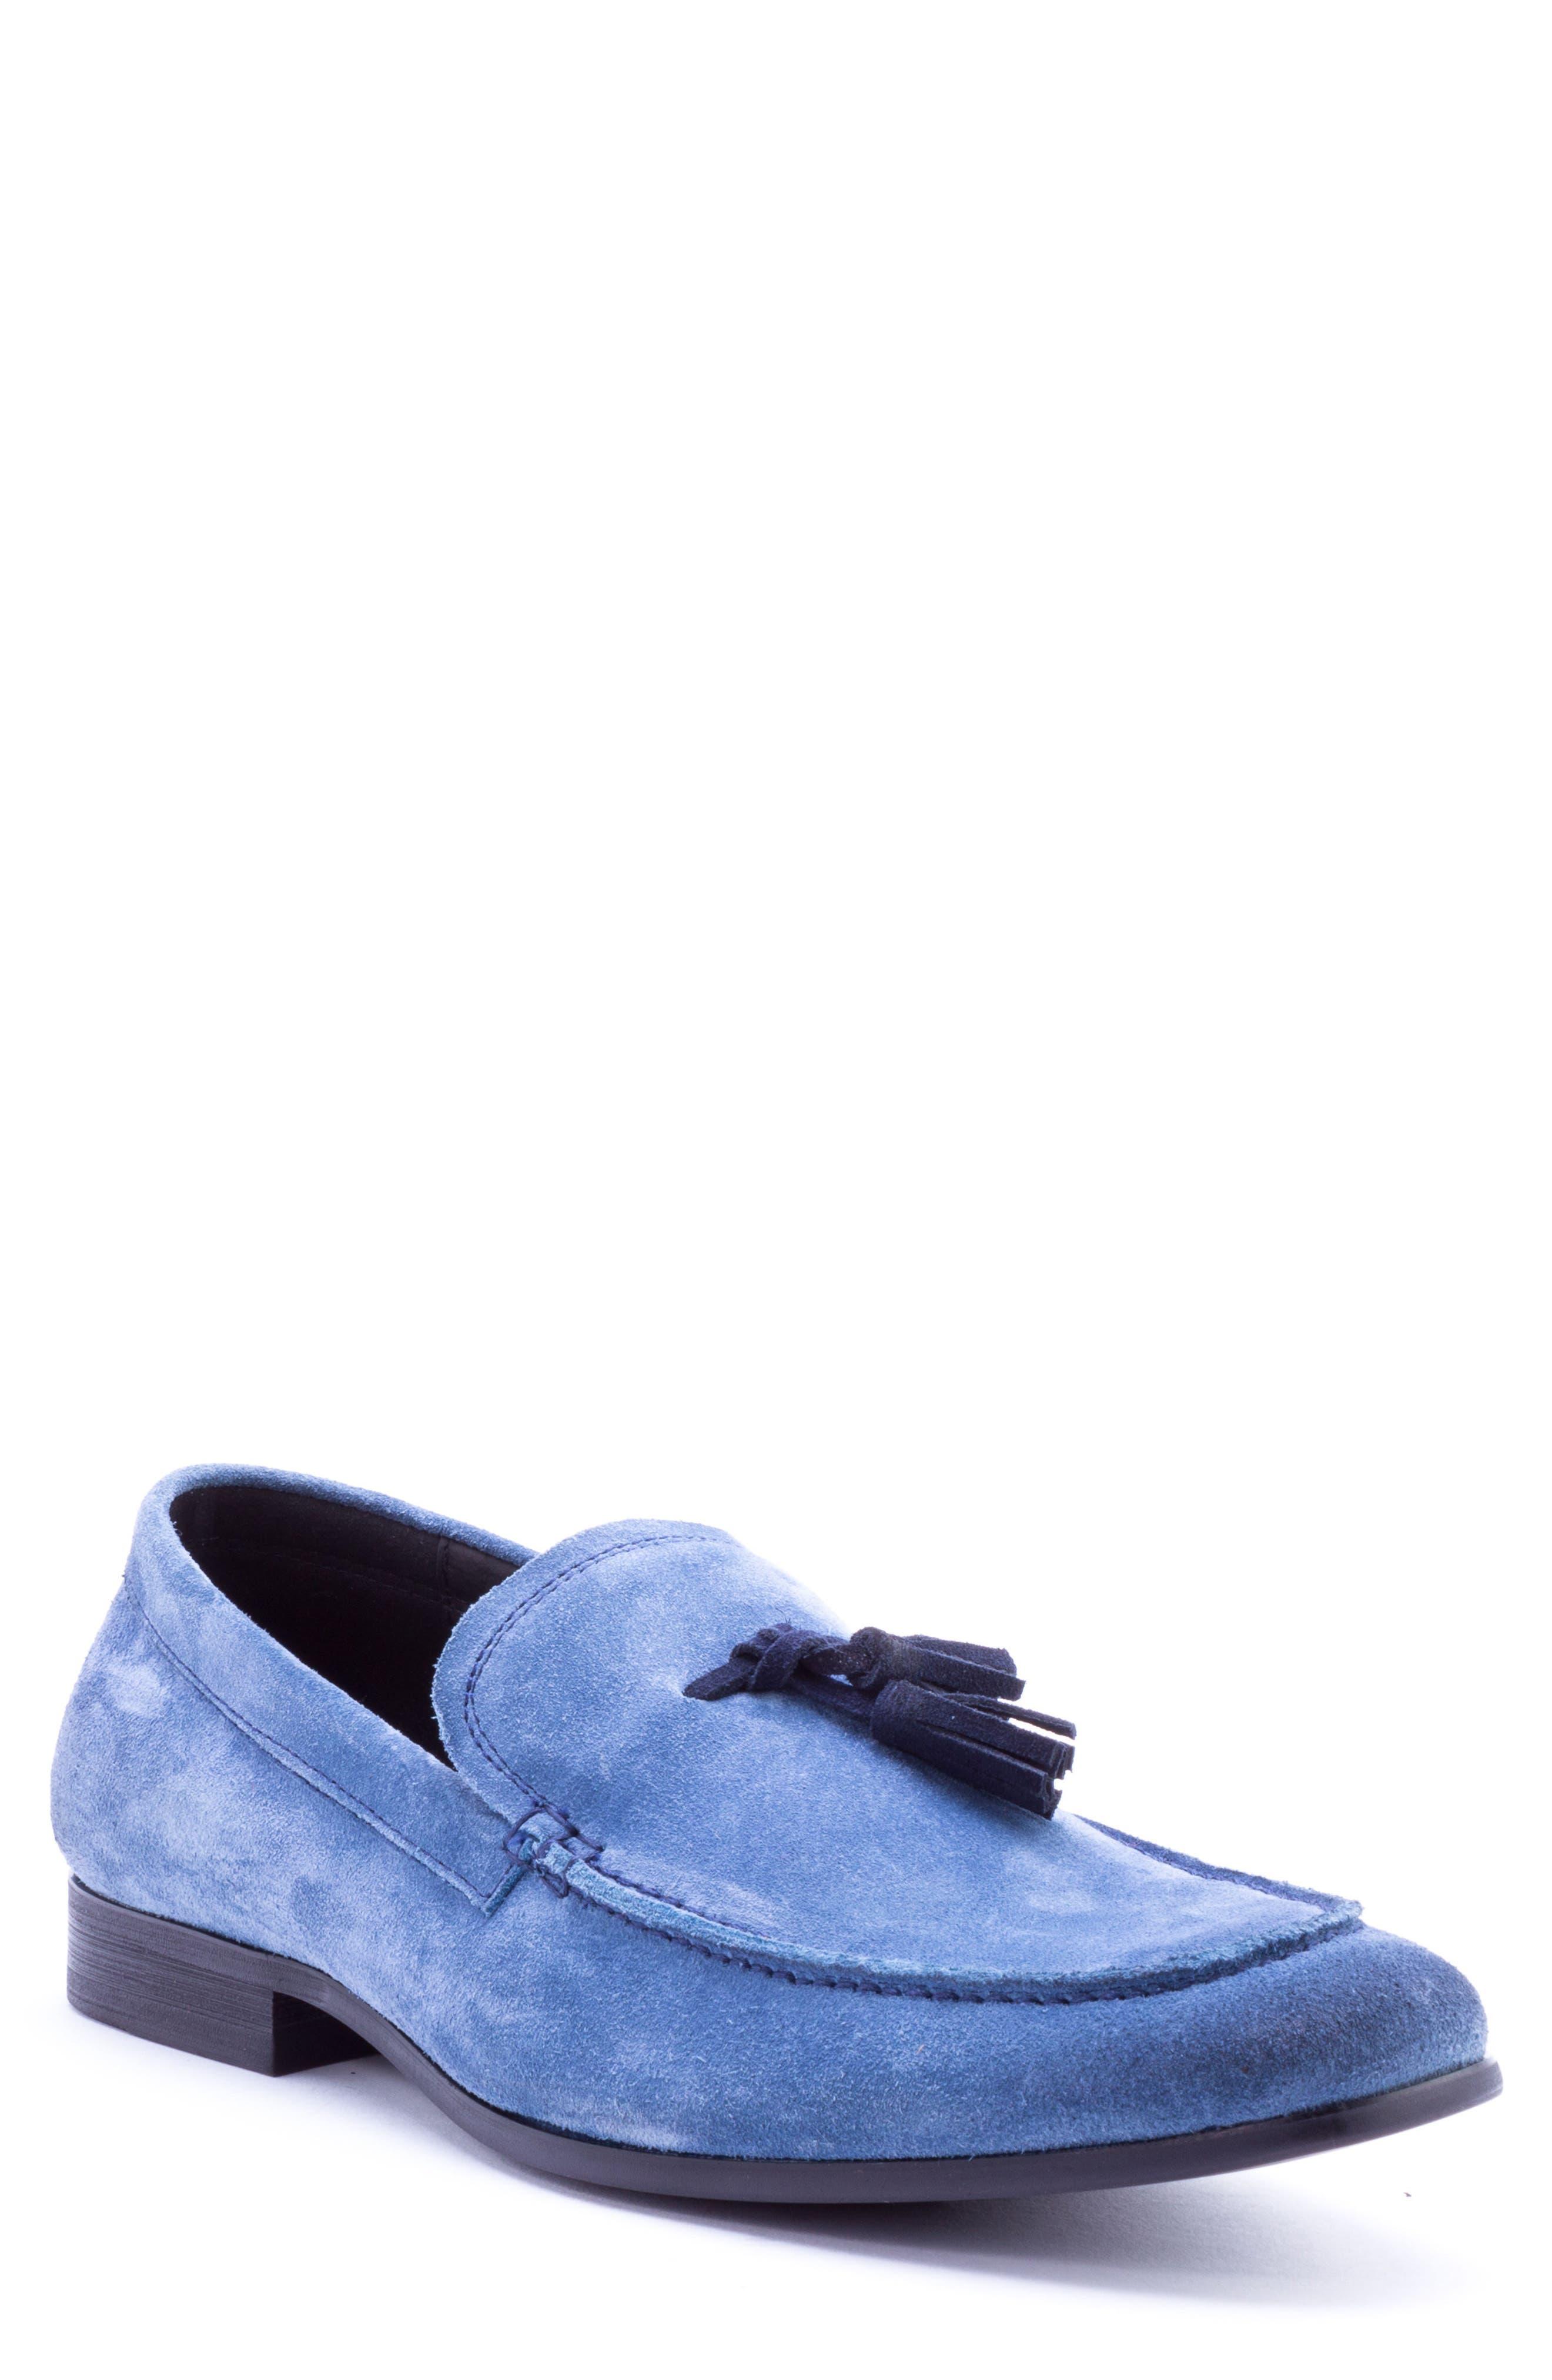 Severn Tassel Venetian Loafer,                             Main thumbnail 1, color,                             Blue Suede